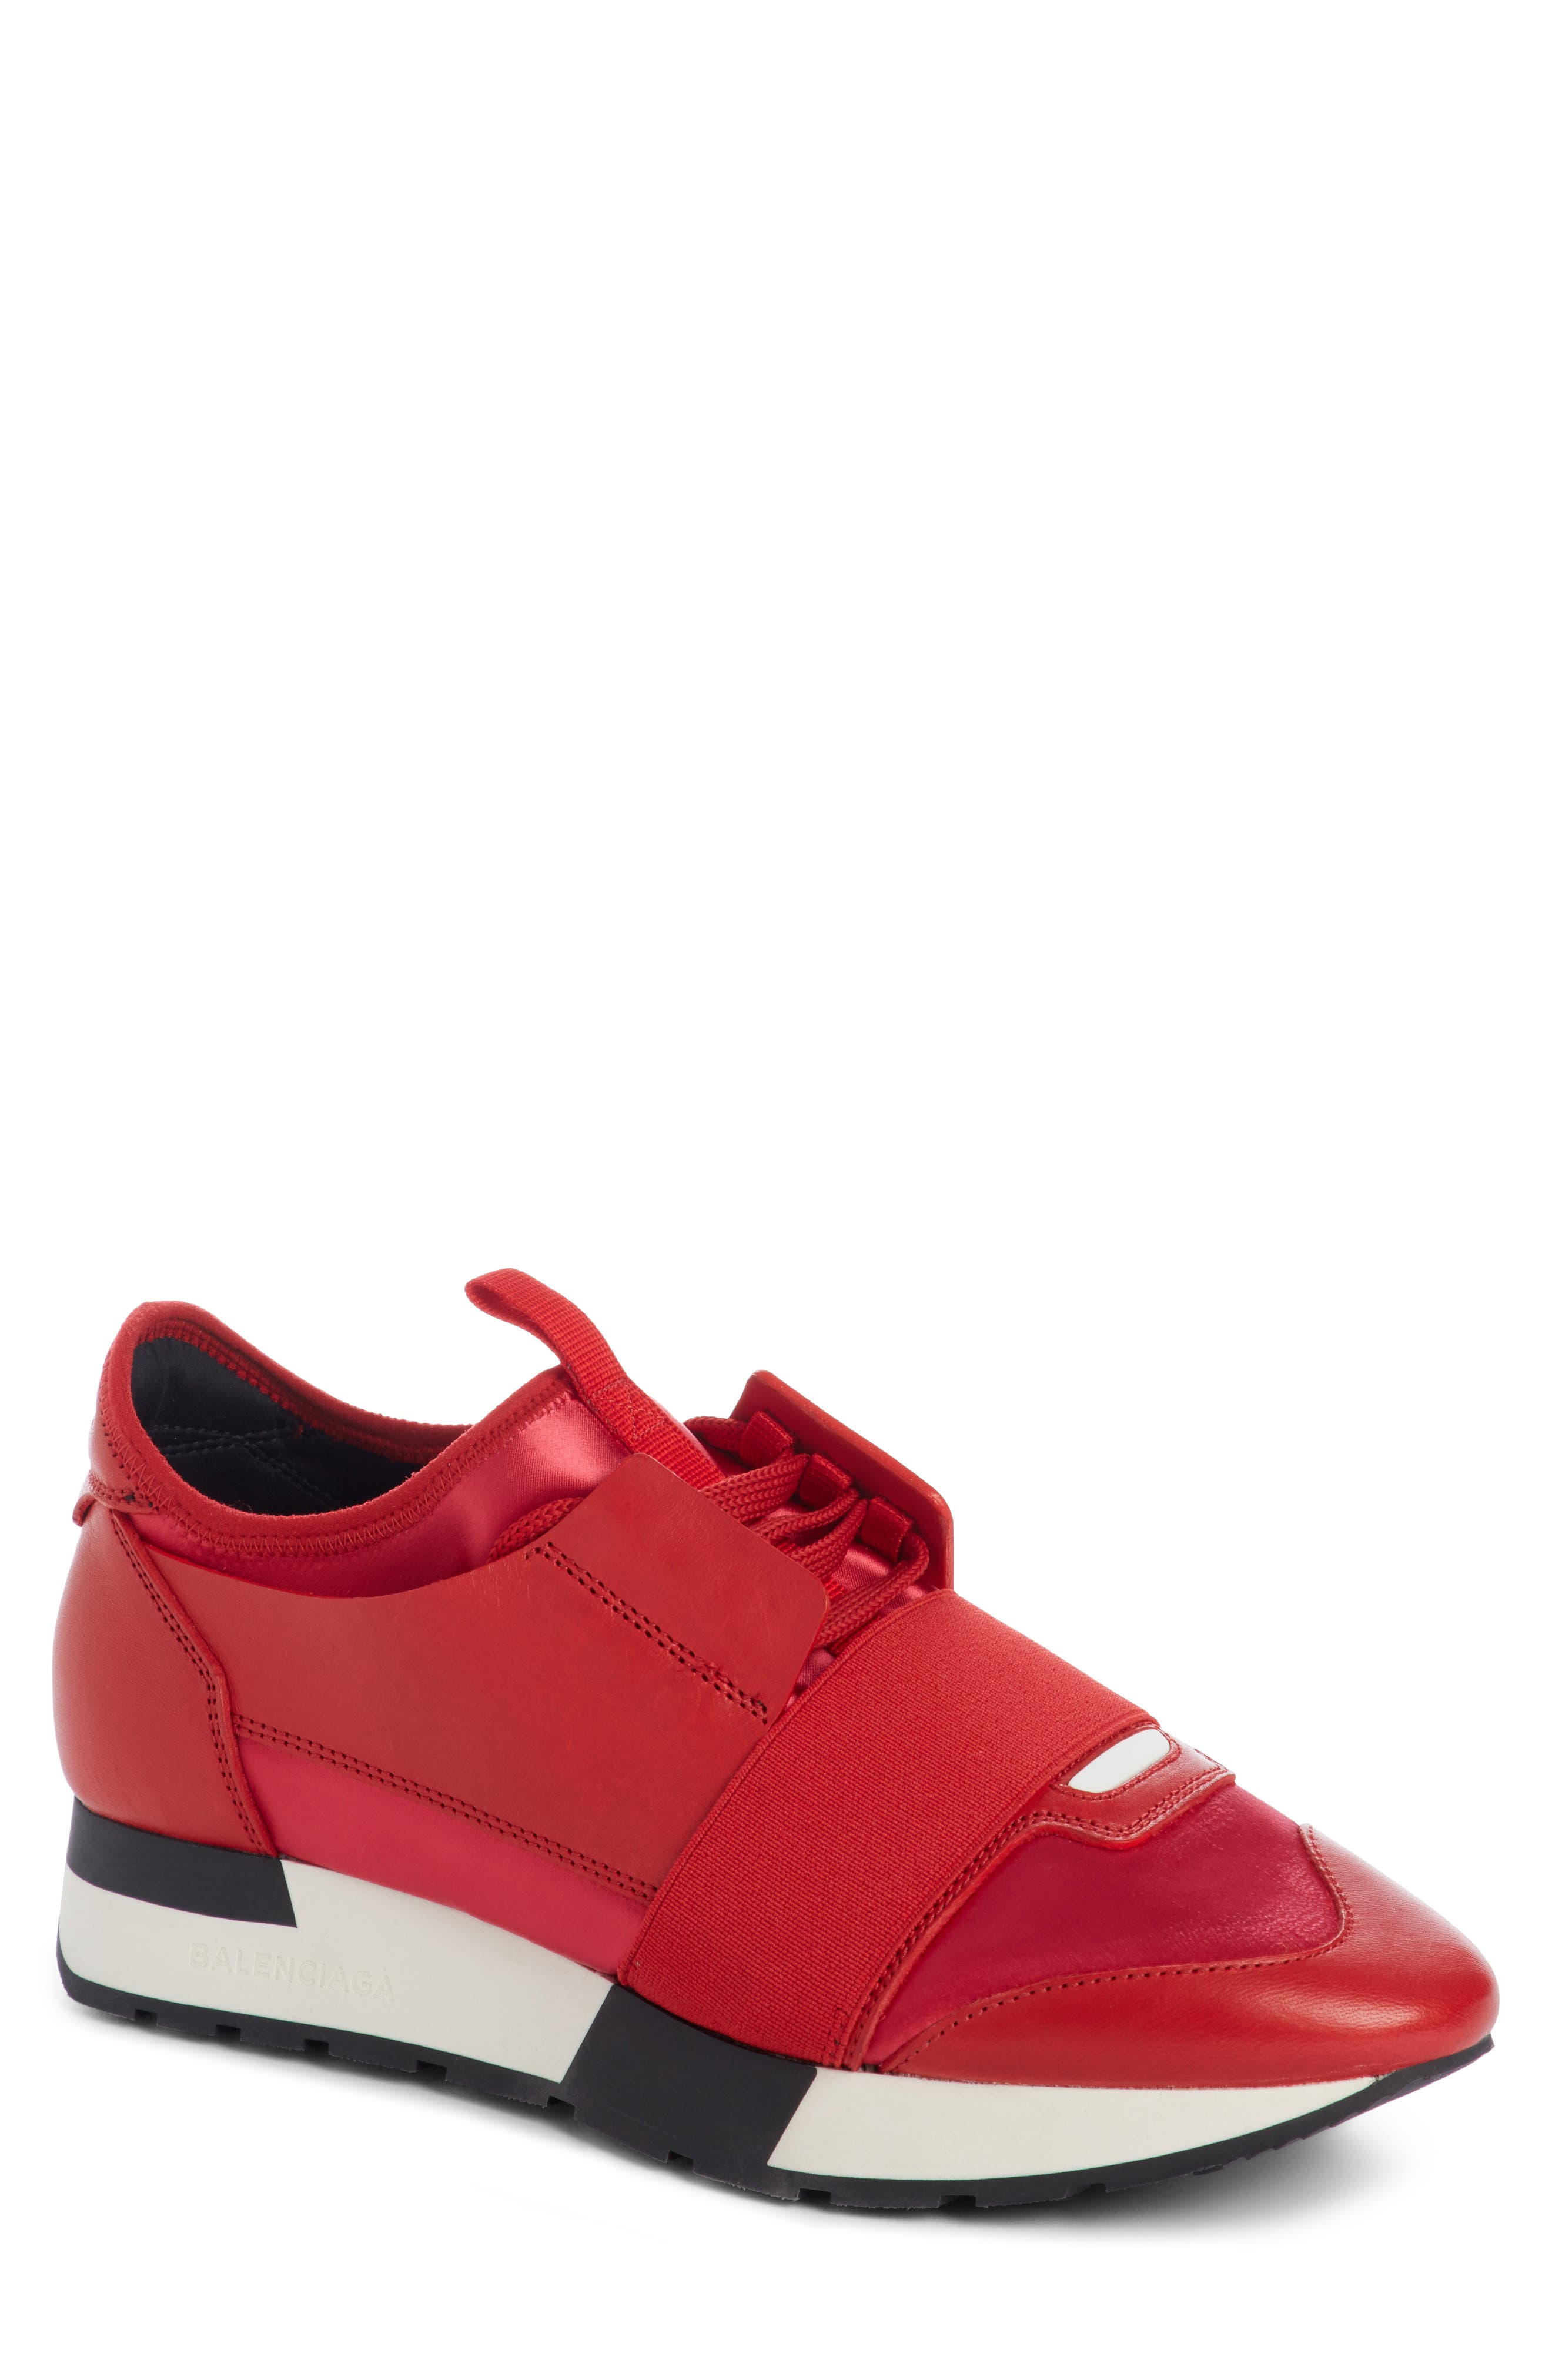 Balenciaga Mixed Media Trainer Sneaker (Women)